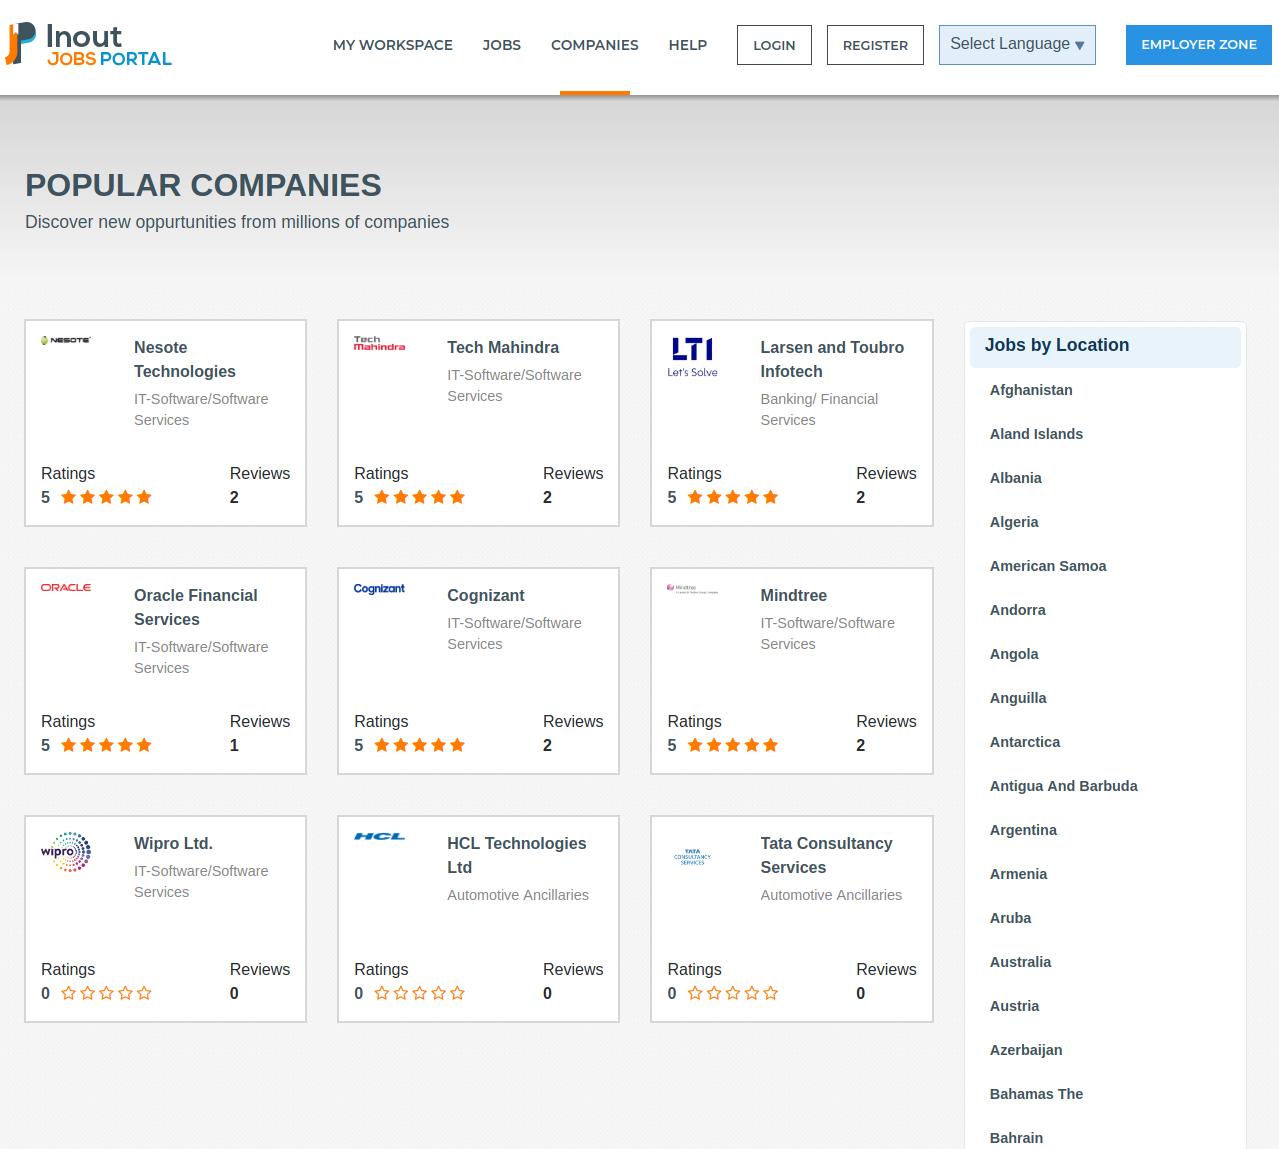 Inout Jobs Portal - Screenshot 2